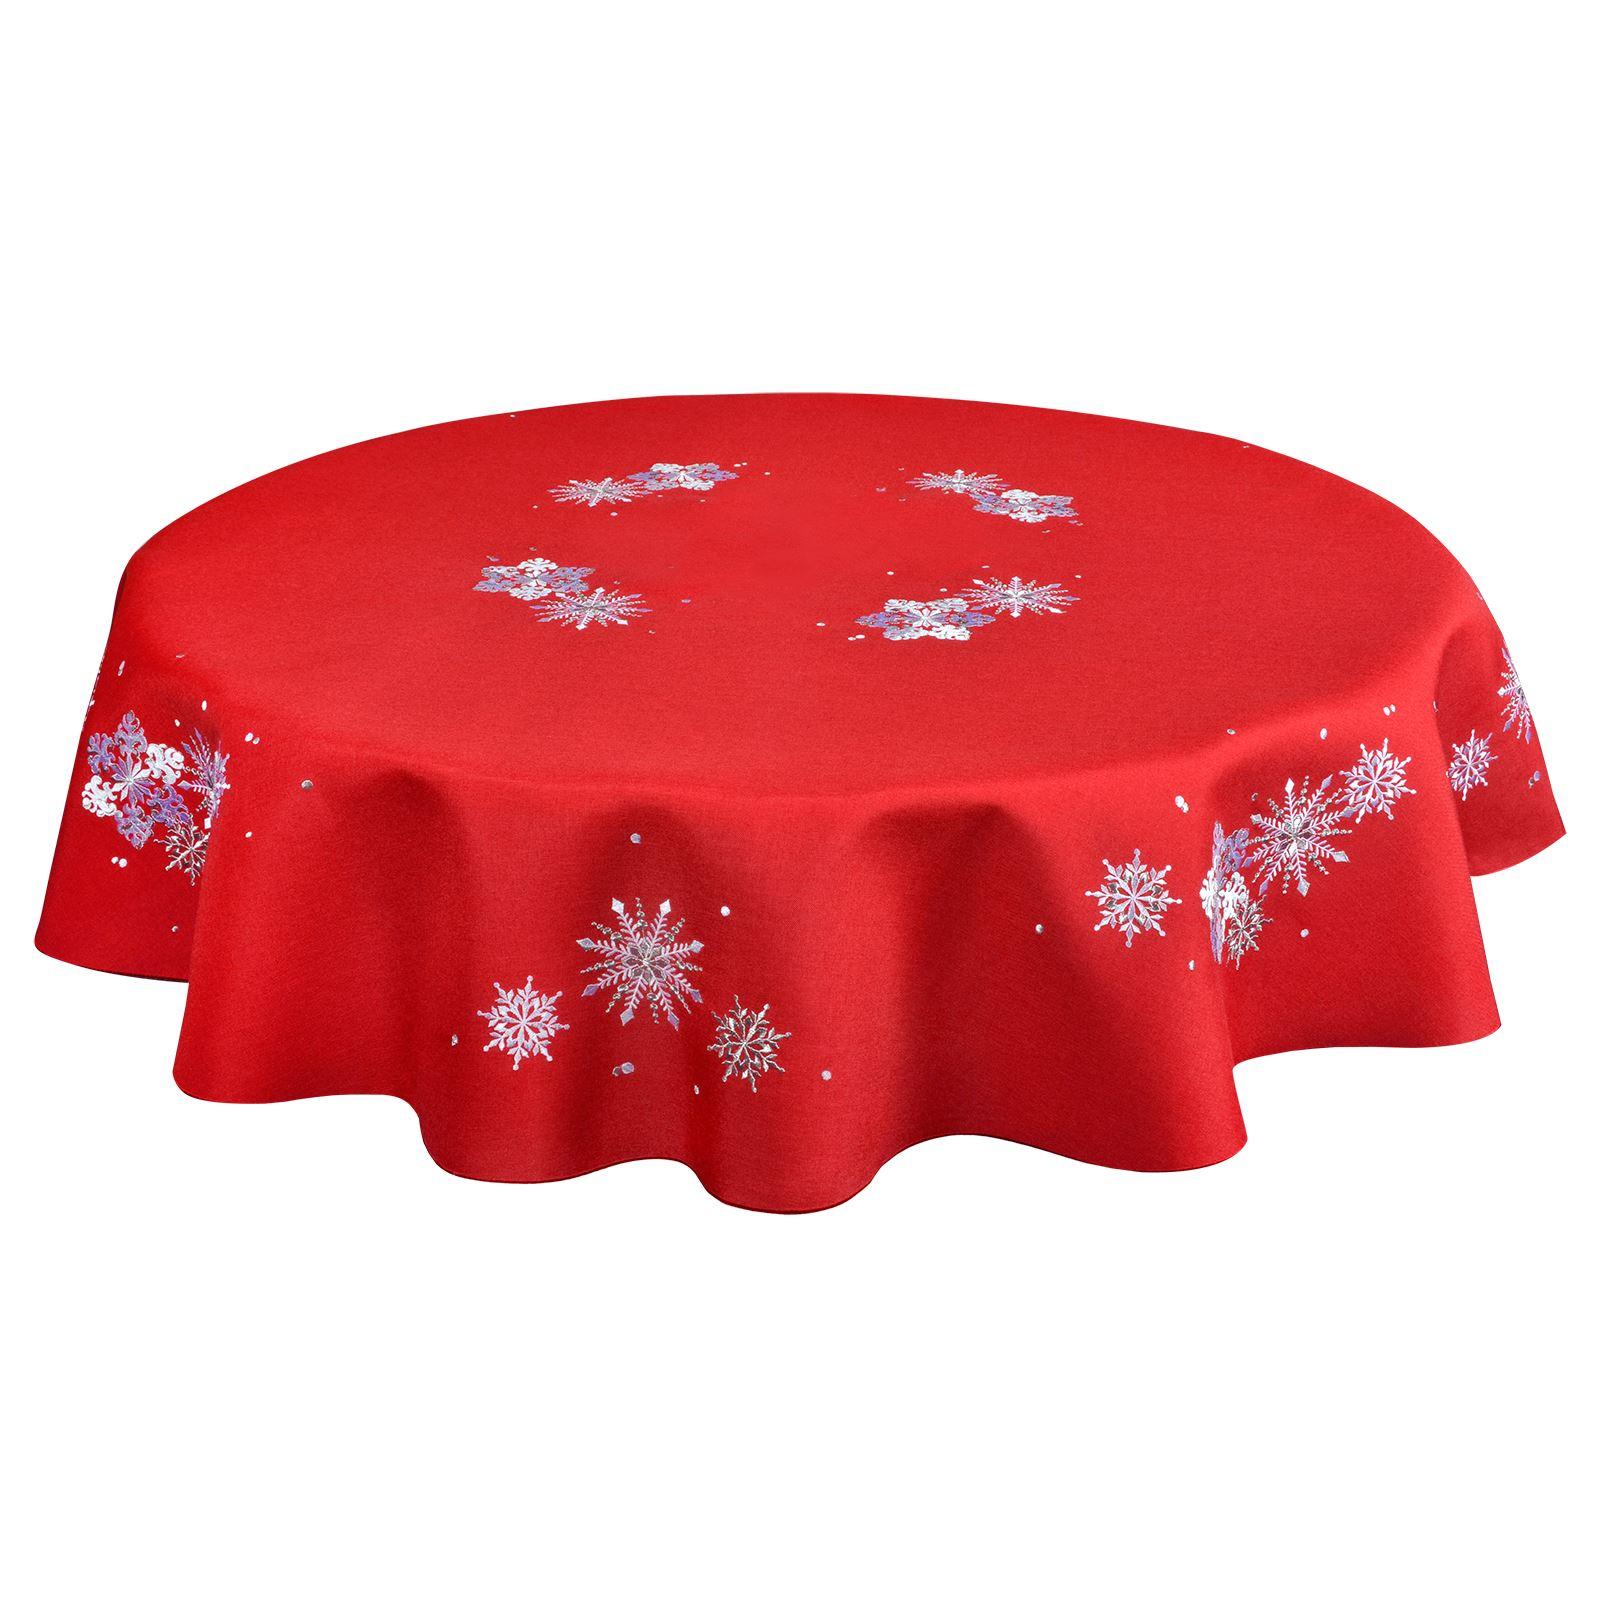 Christmas-Tablecloth-Festive-Pattern-Rectangle-Round-Fabric-Xmas-Room-Decoration Indexbild 39